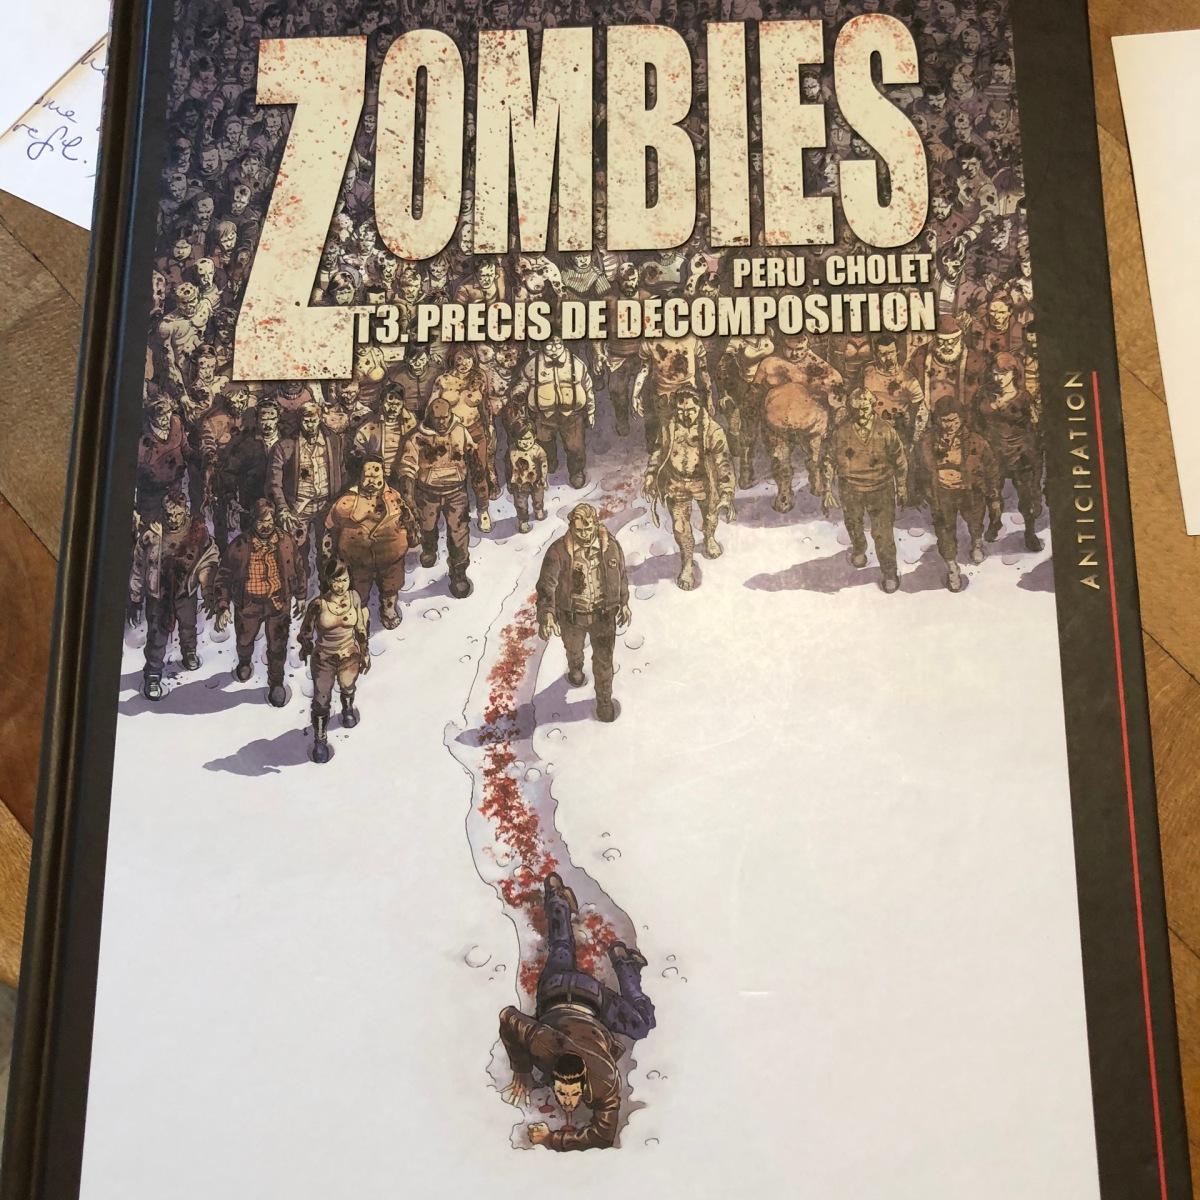 Matching Game III: Zombies and visarenewals